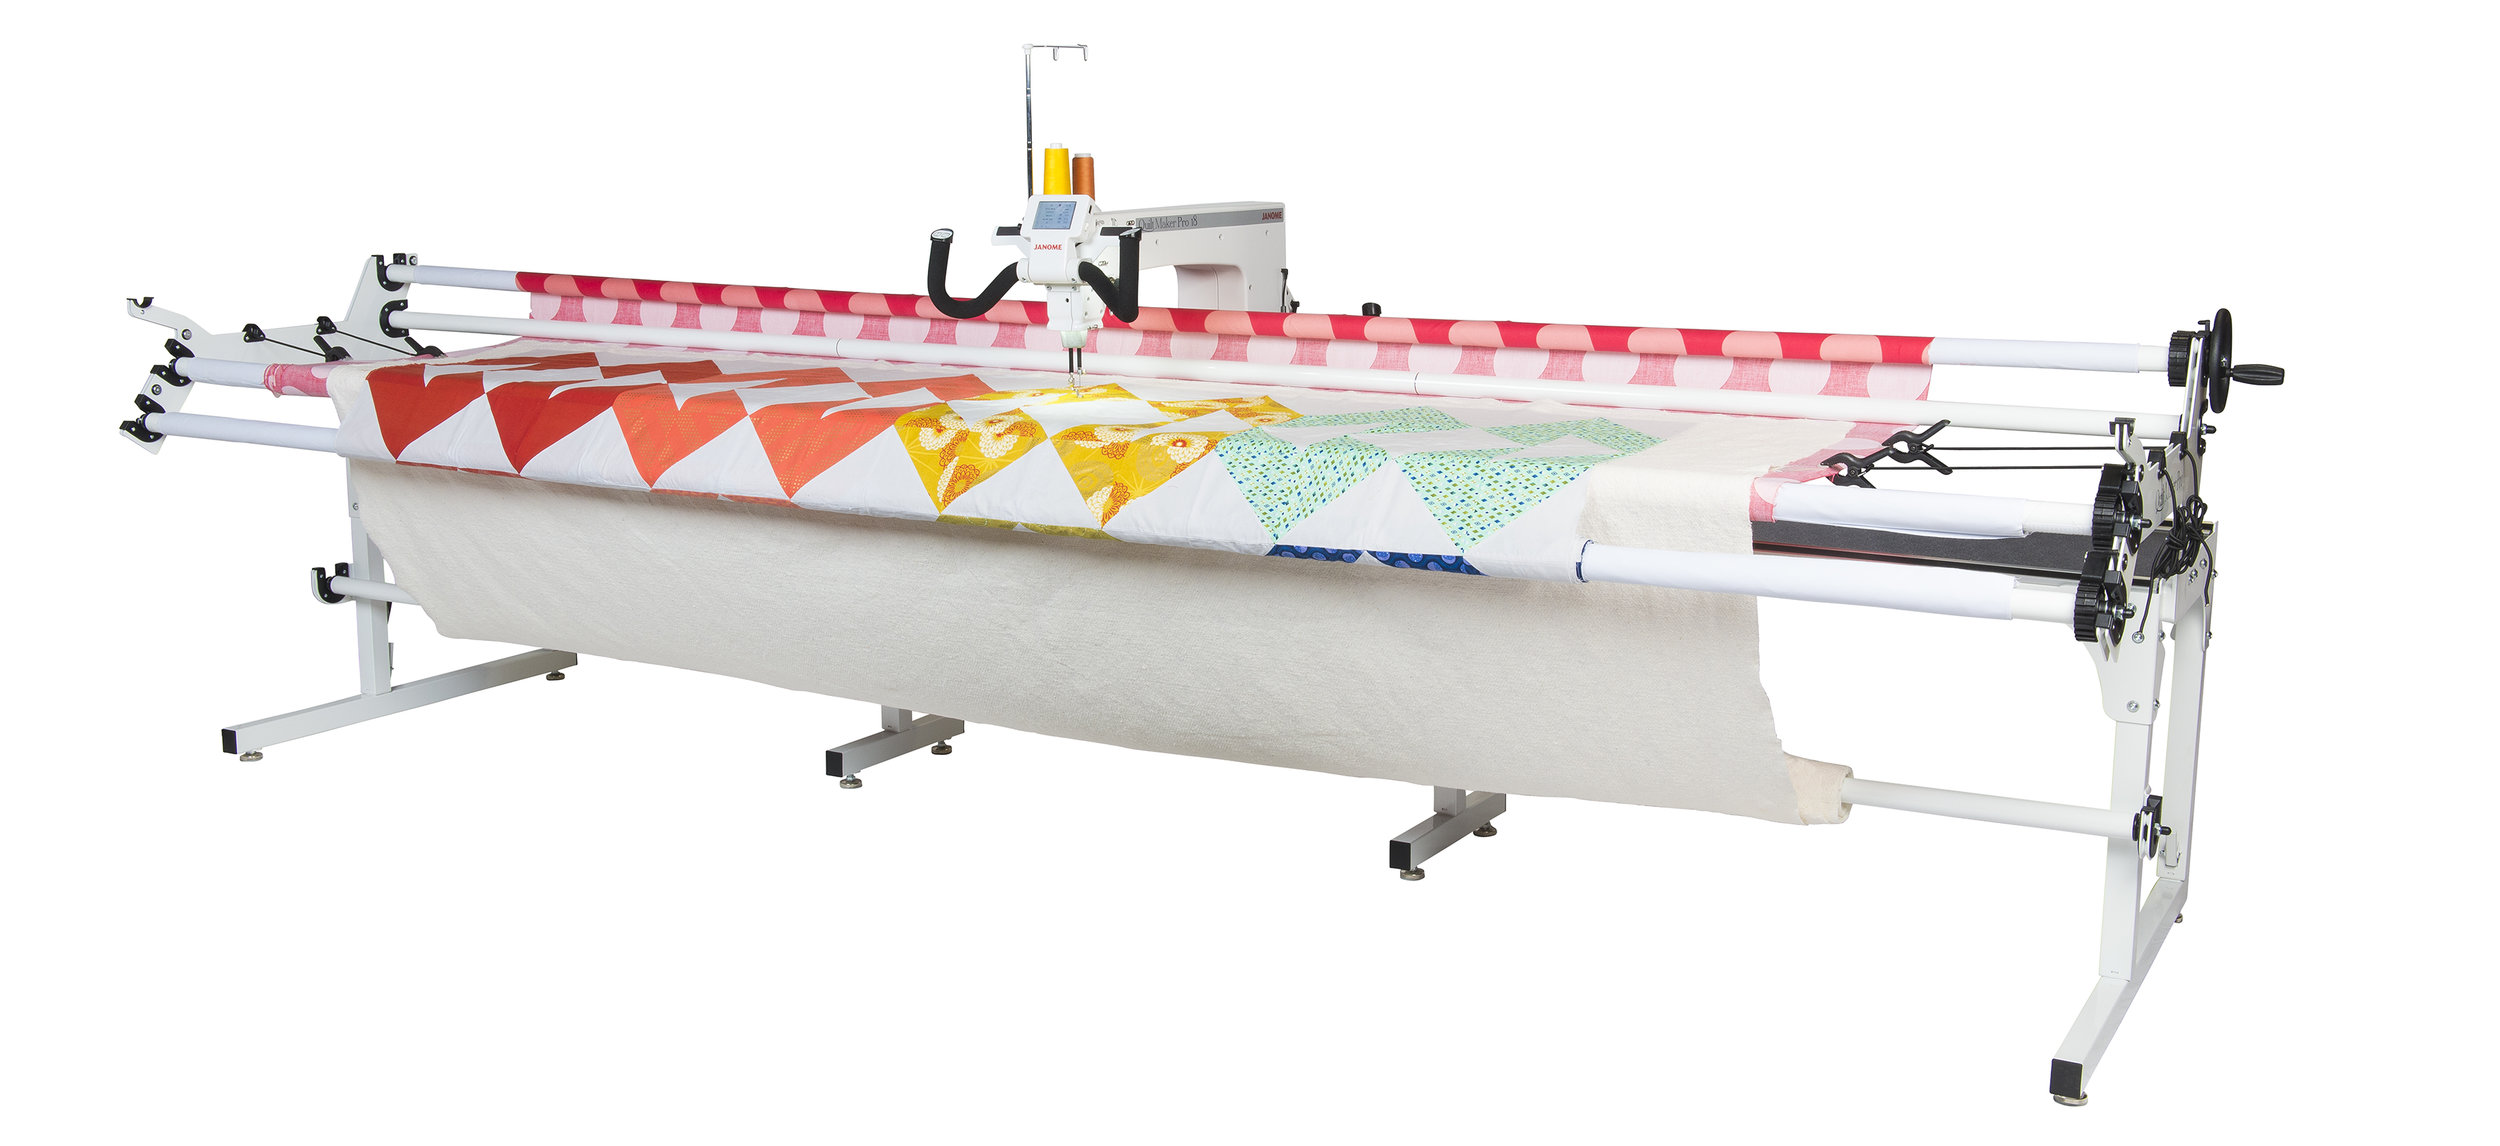 "Janome quilt maker pro  * 18"" machine Arm  * 12' Frame  * Digital LCD touch screen  * digital tension  * stitch regulator"